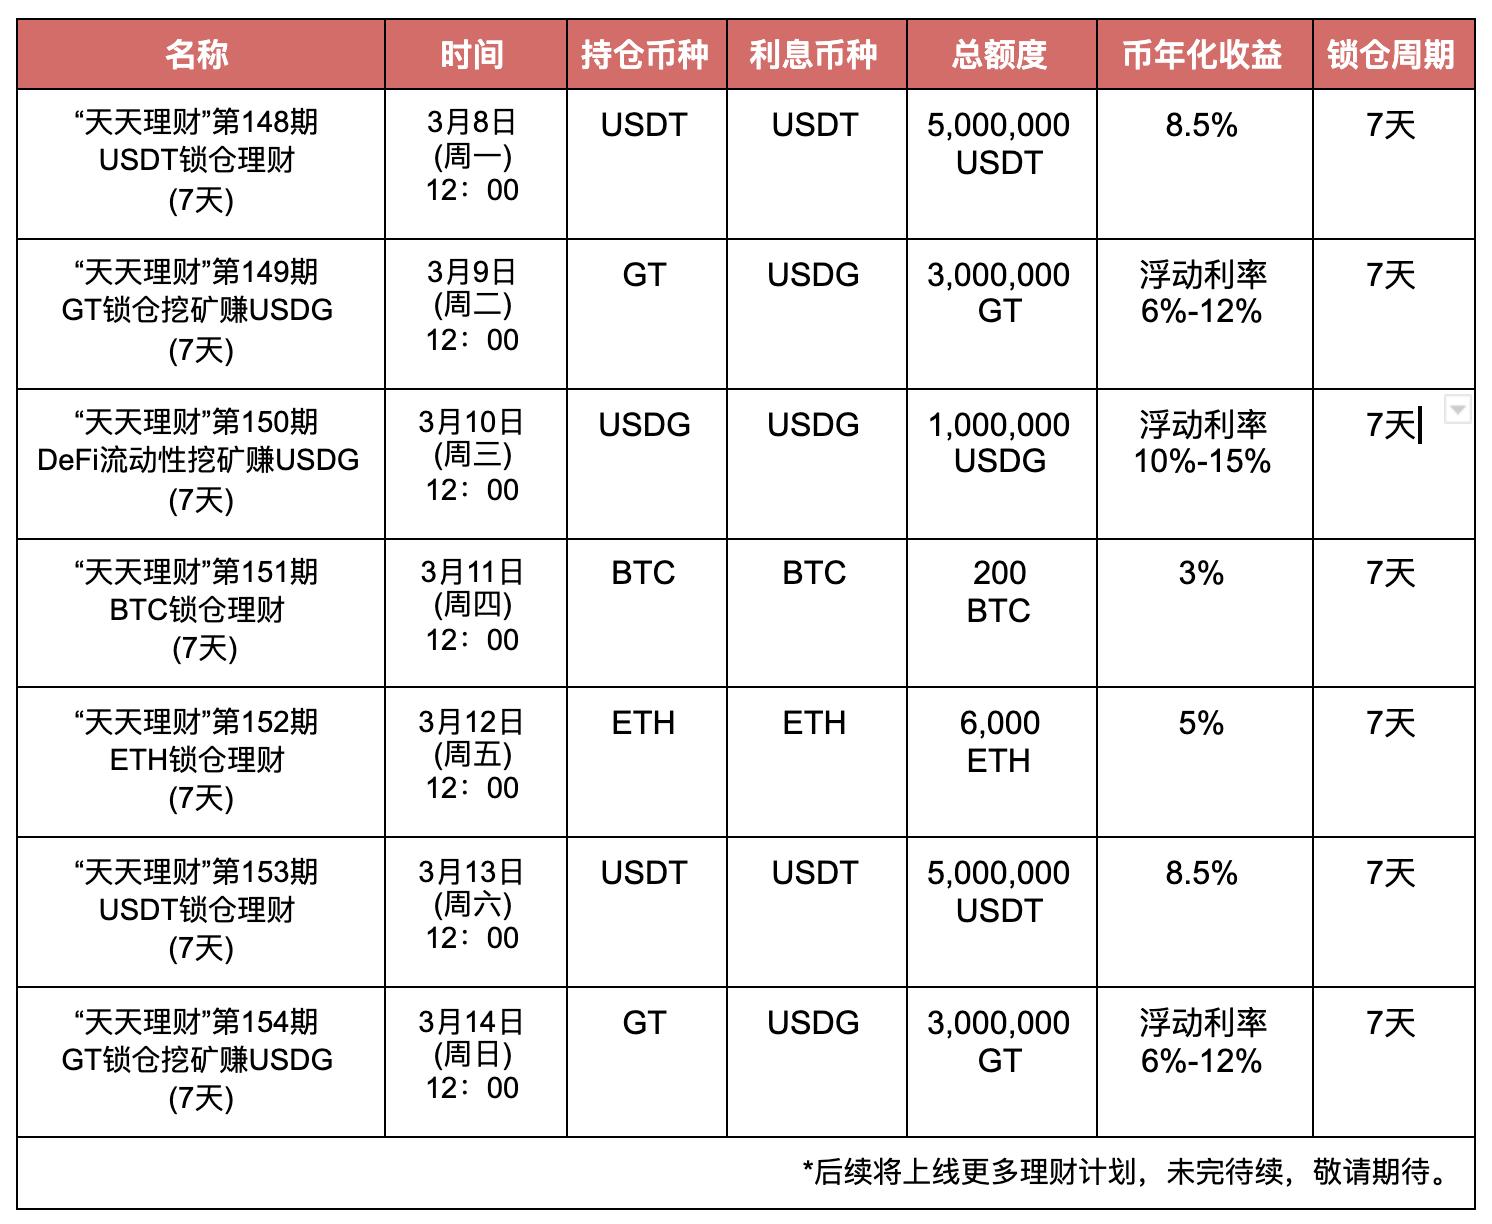 "Gate.io""天天理财"" 第149期 GT锁仓挖矿赚USDG理财,年化最高12%"